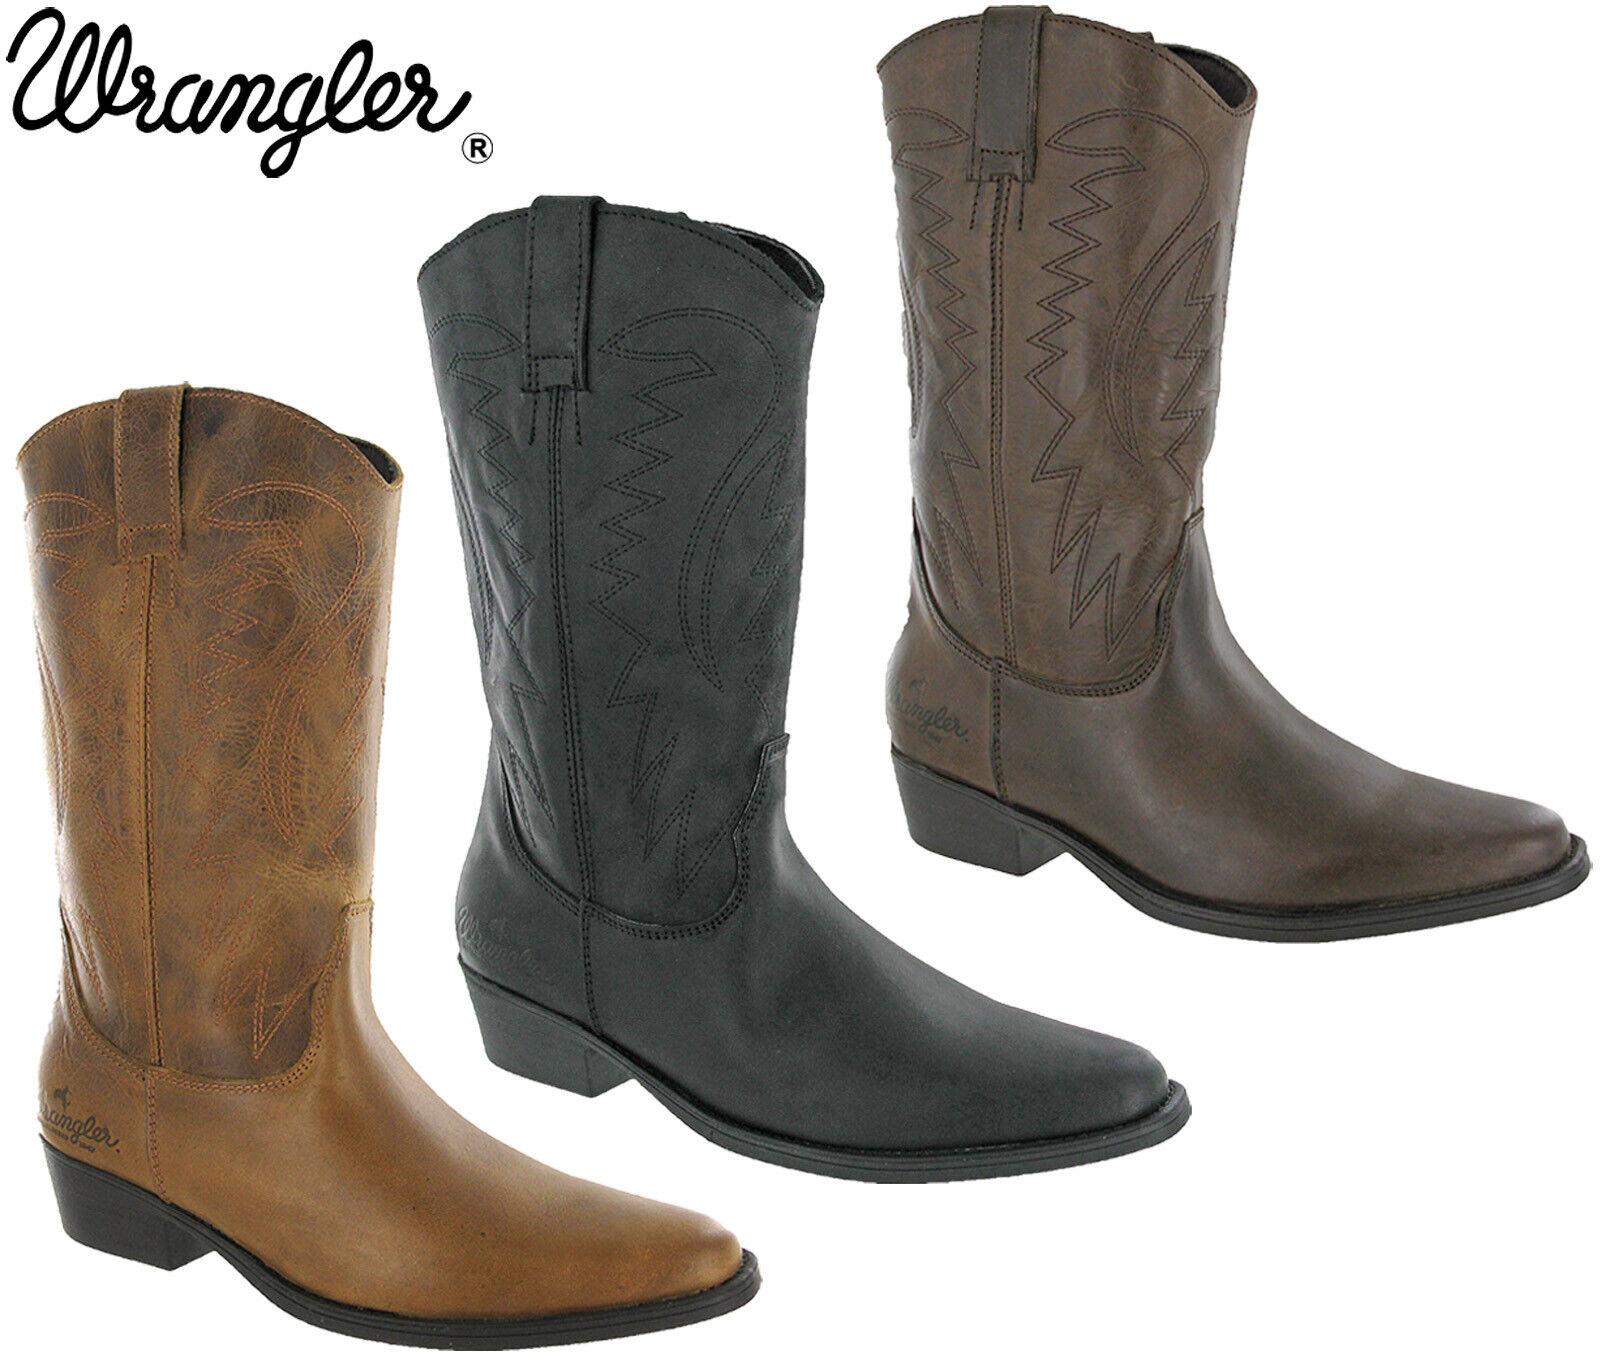 Dettagli su Wrangler Stivali da Cowboy Western Tex Hi Polpaccio pelle Tacco Infilare UK 7 12